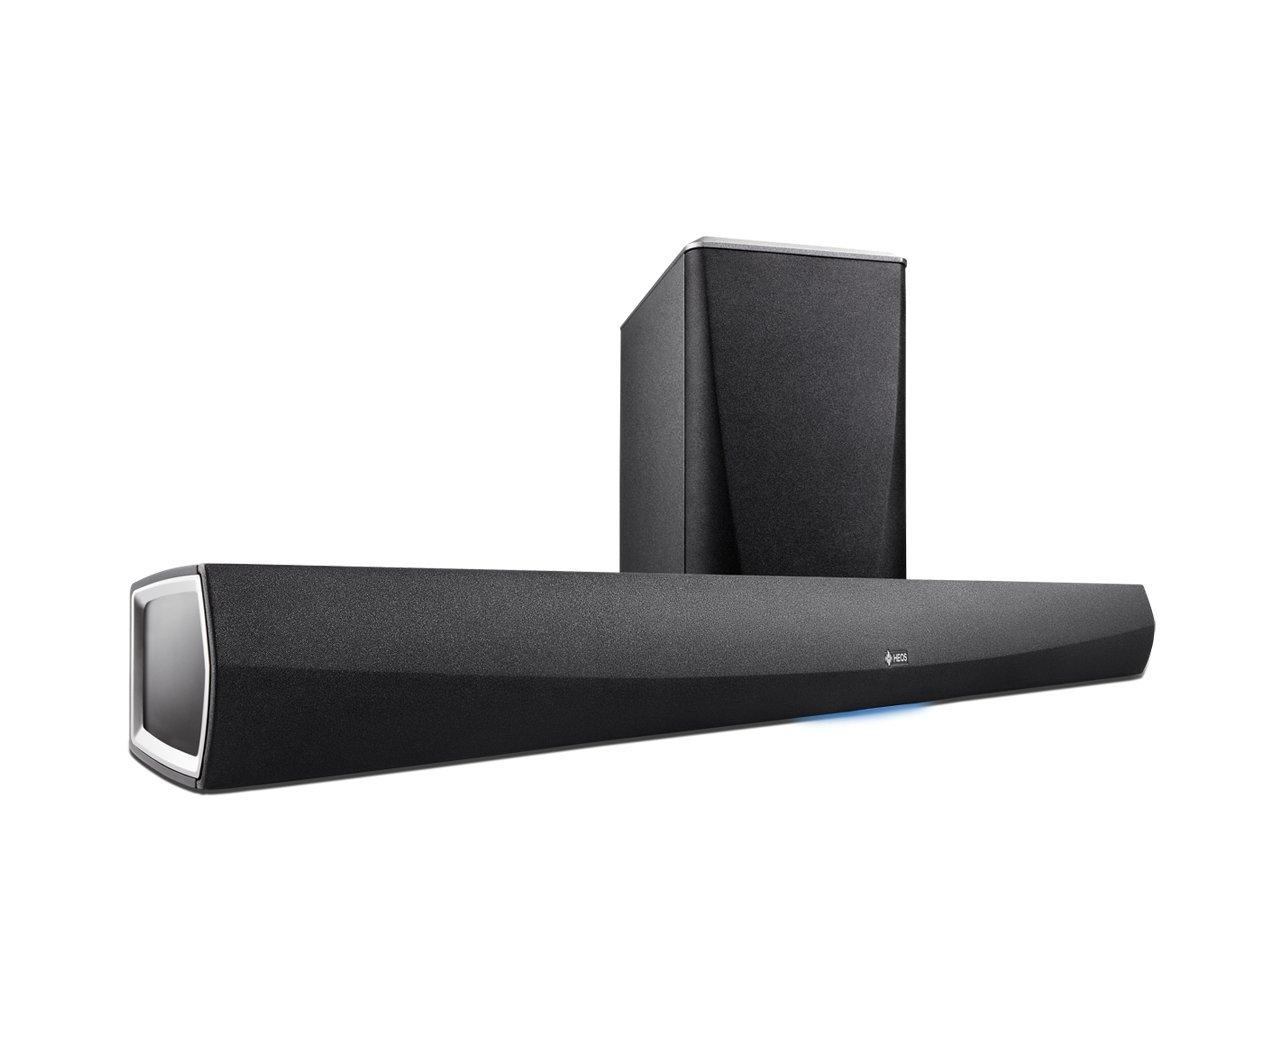 57c24efa4d1 Amazon.com  Denon HEOS HomeCinema Soundbar   Subwoofer  Electronics